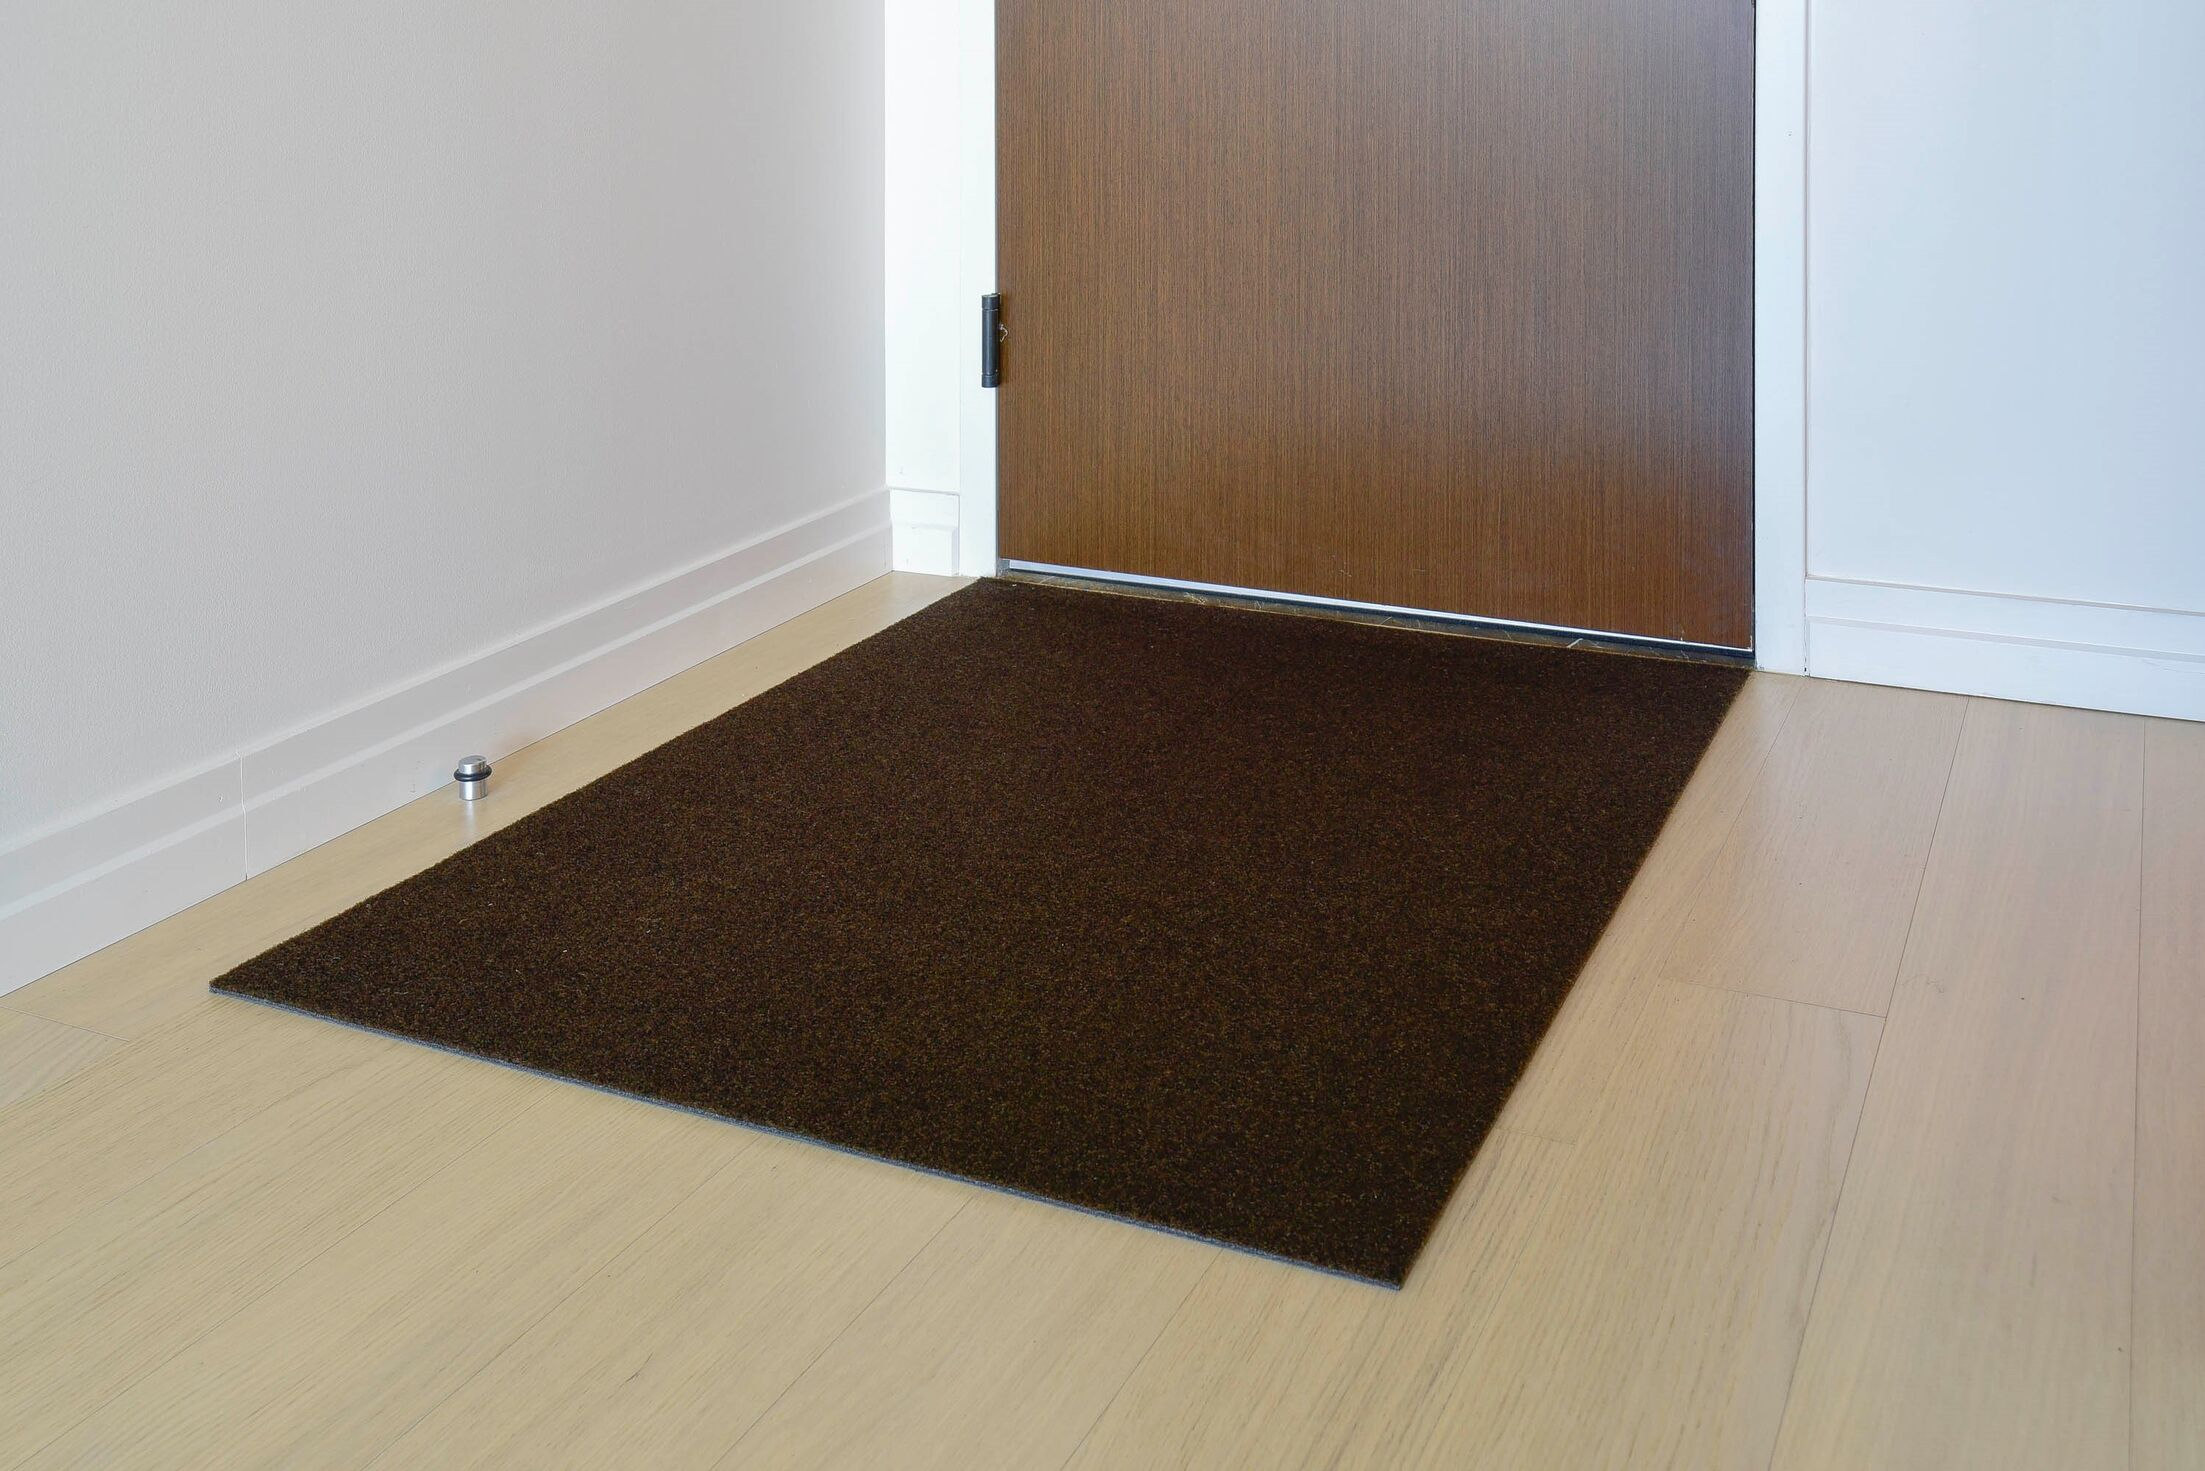 Doormat Mat Size: Rectangle 3' x 4', Color: Walnut